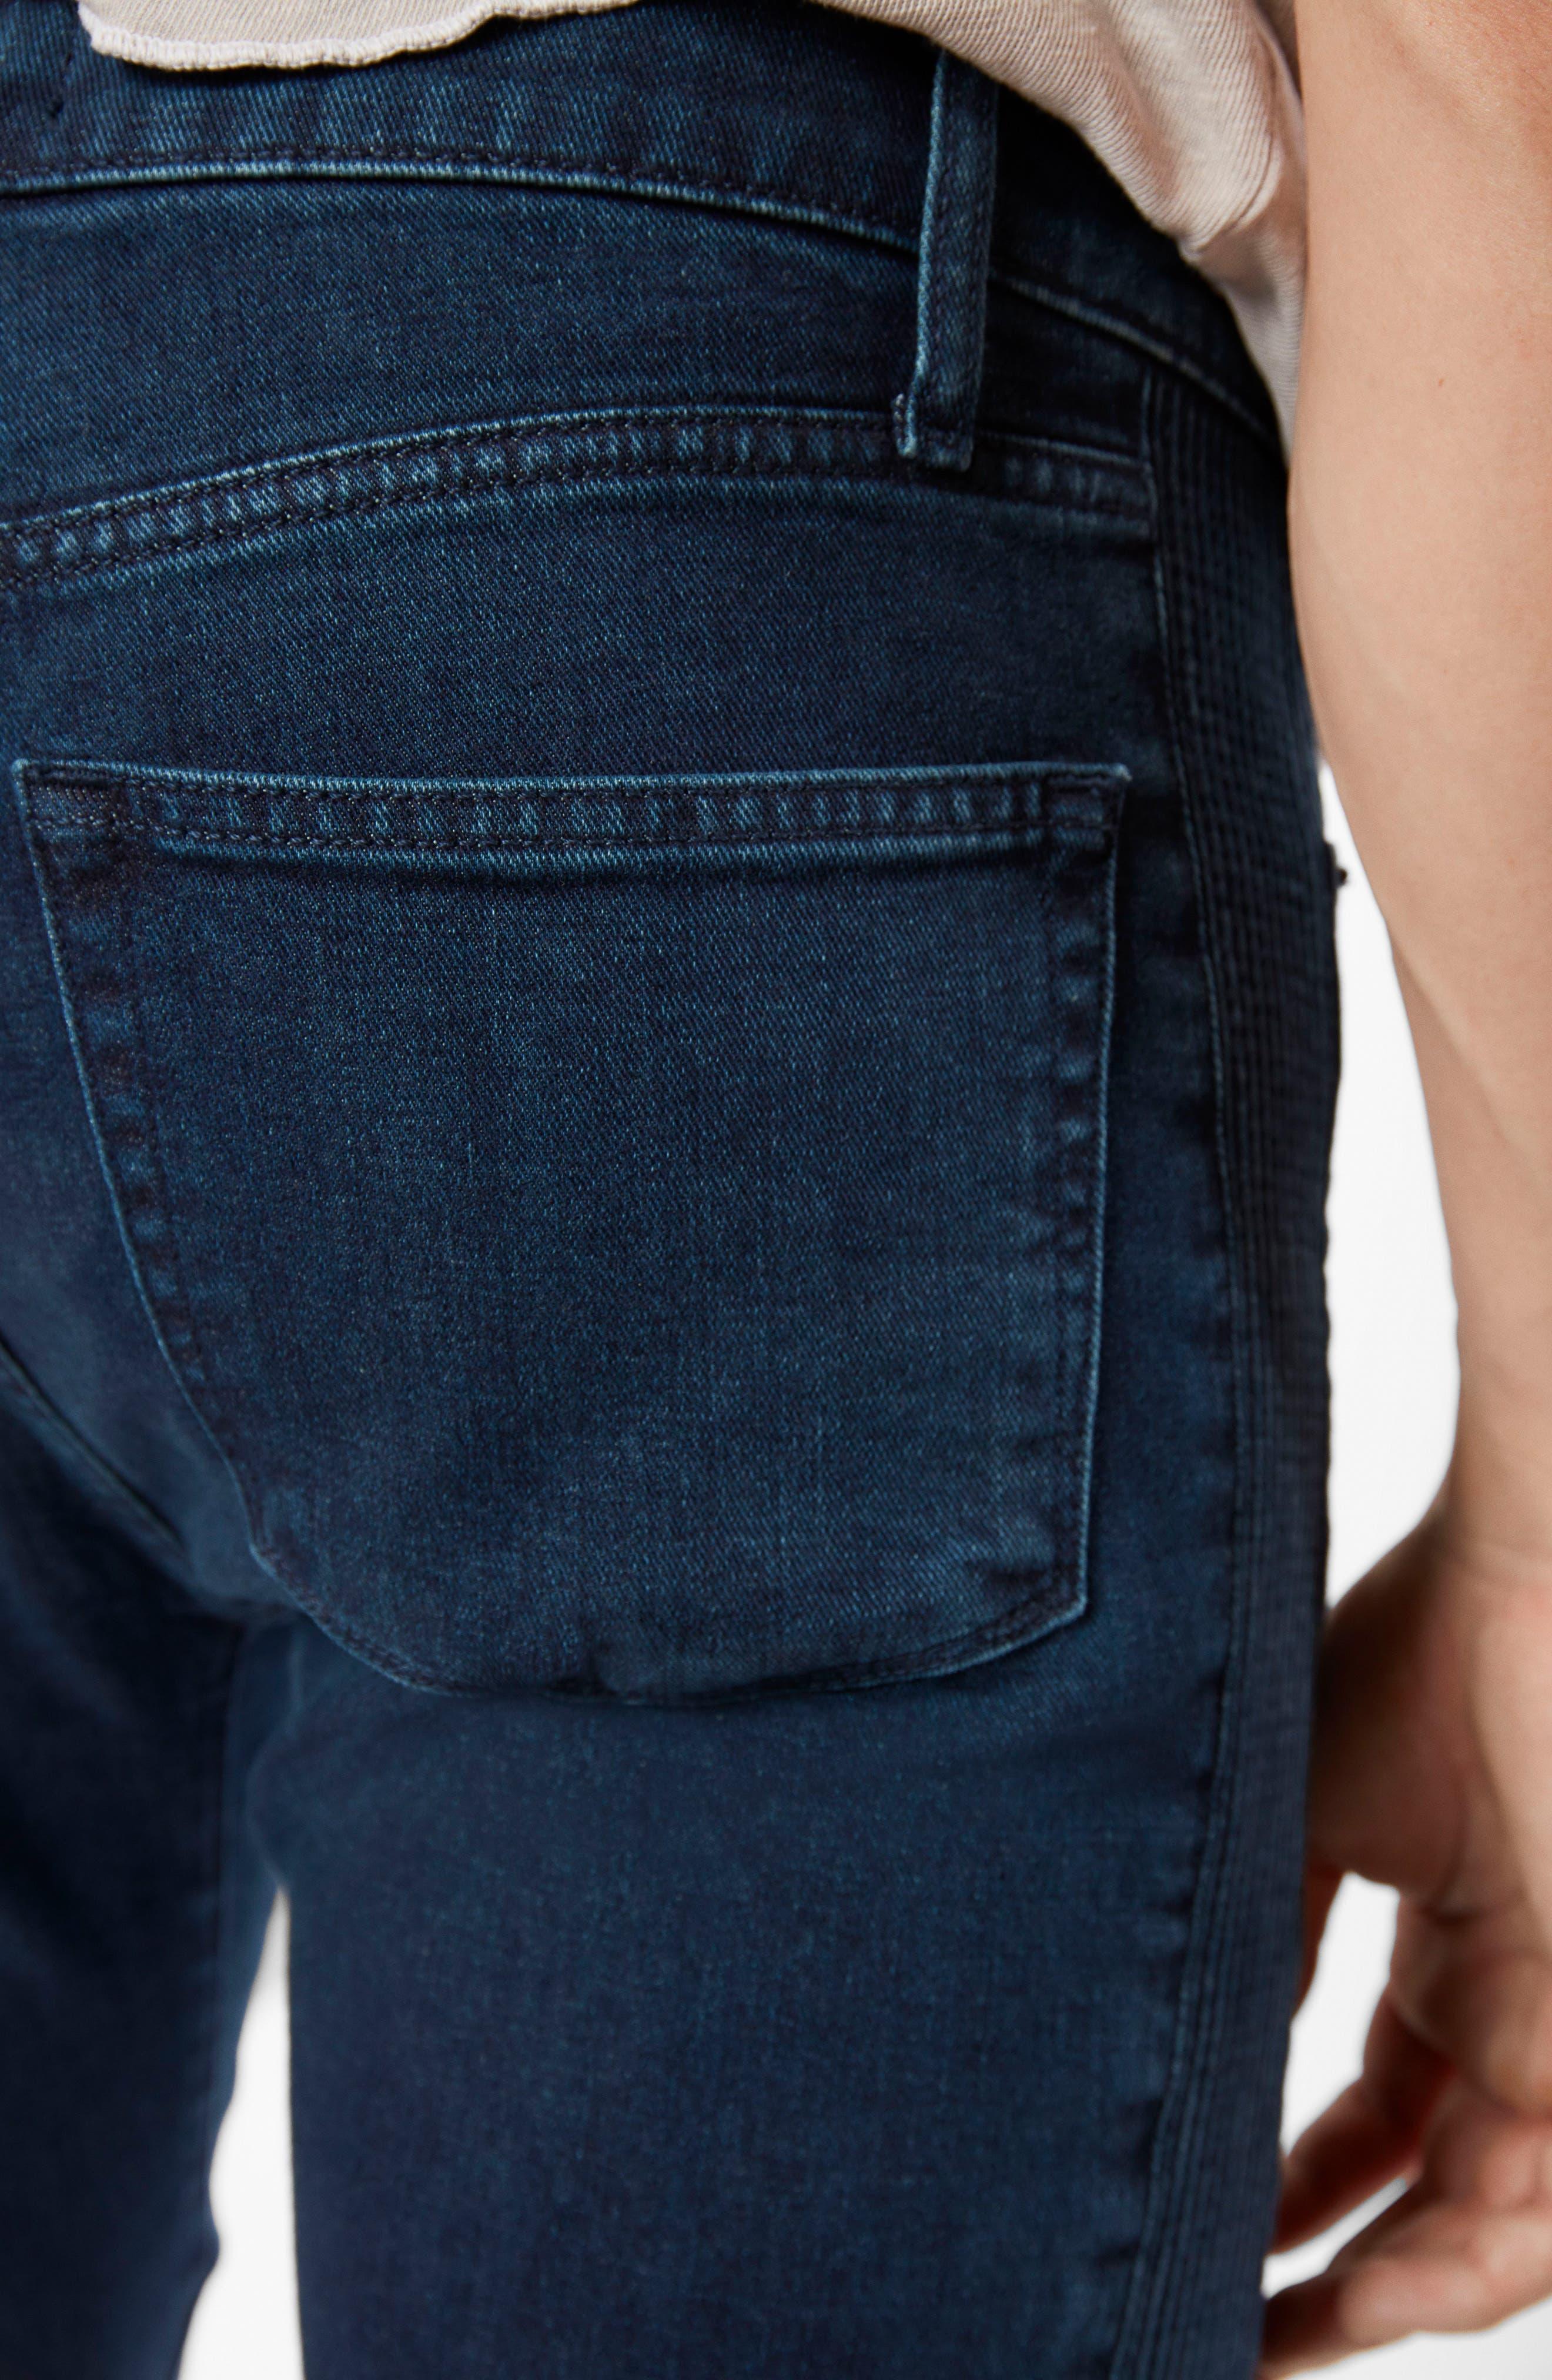 Moto Skinny Fit Jeans,                             Alternate thumbnail 6, color,                             403